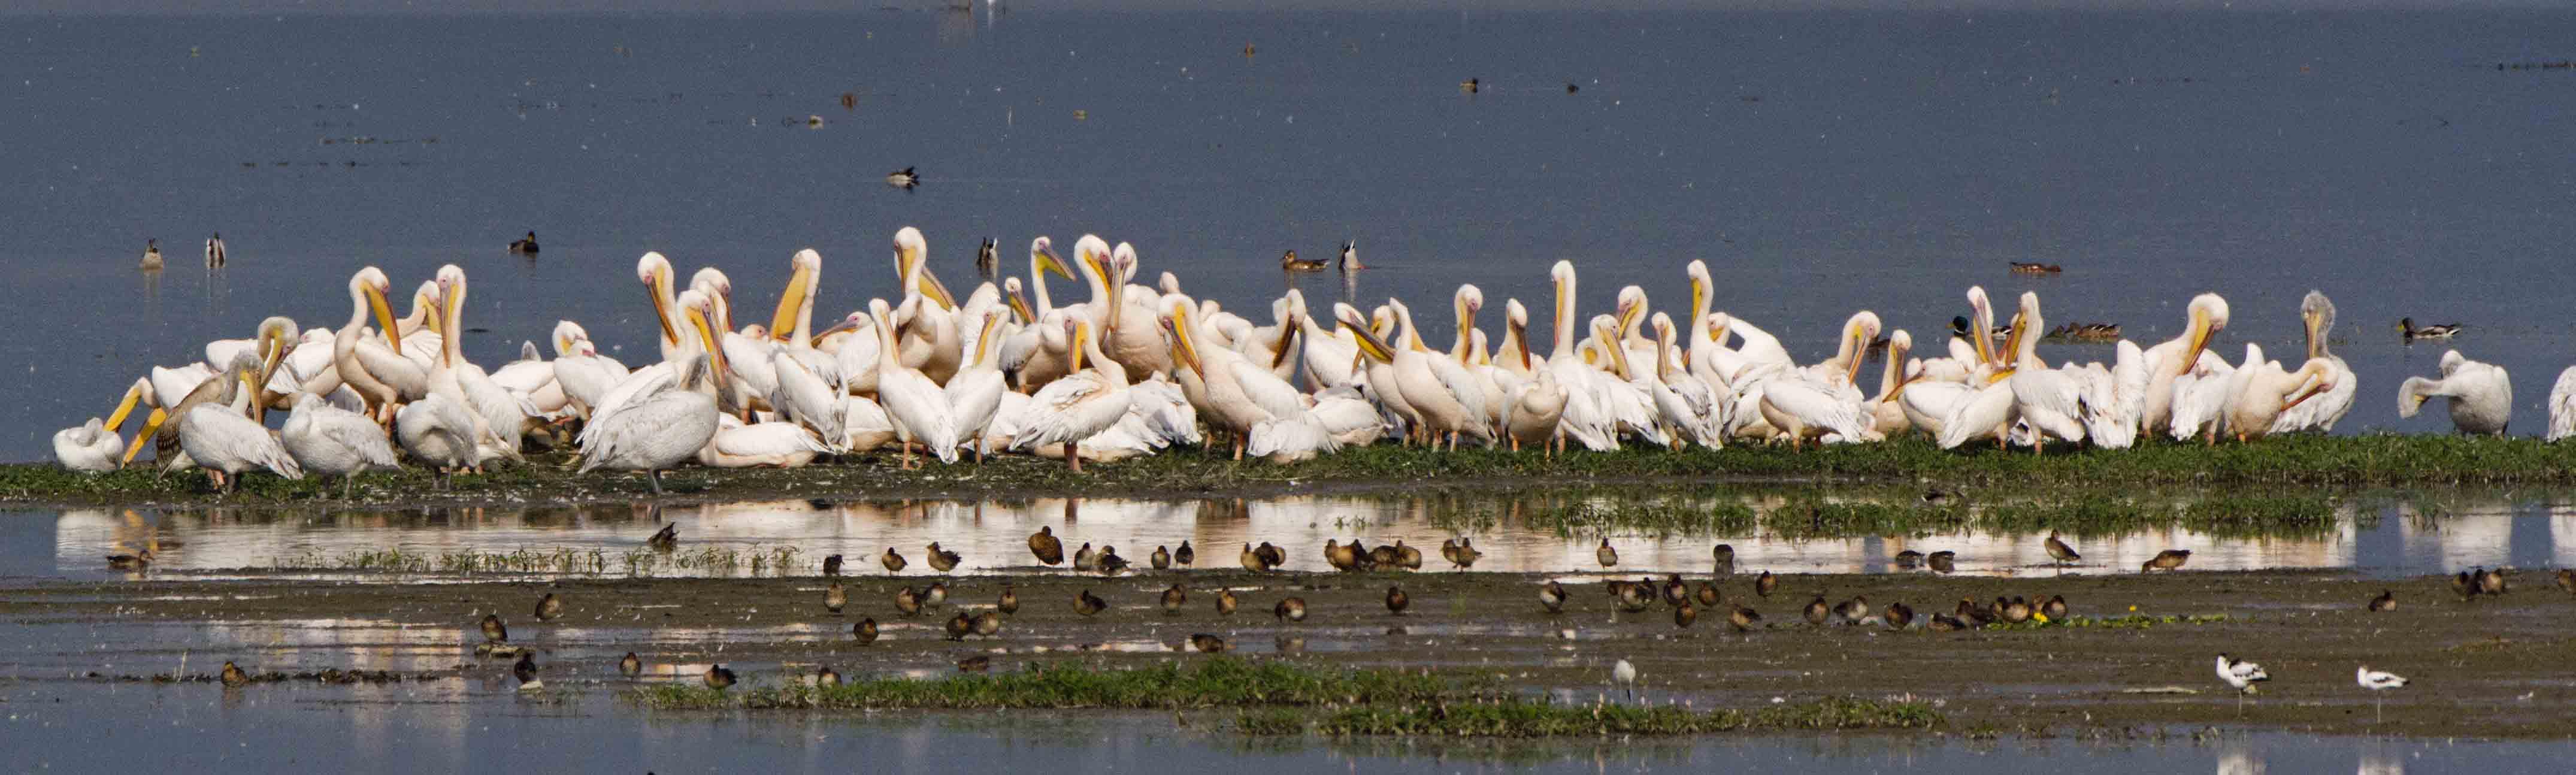 BirdWING (Birdwatching in Northern Greece)